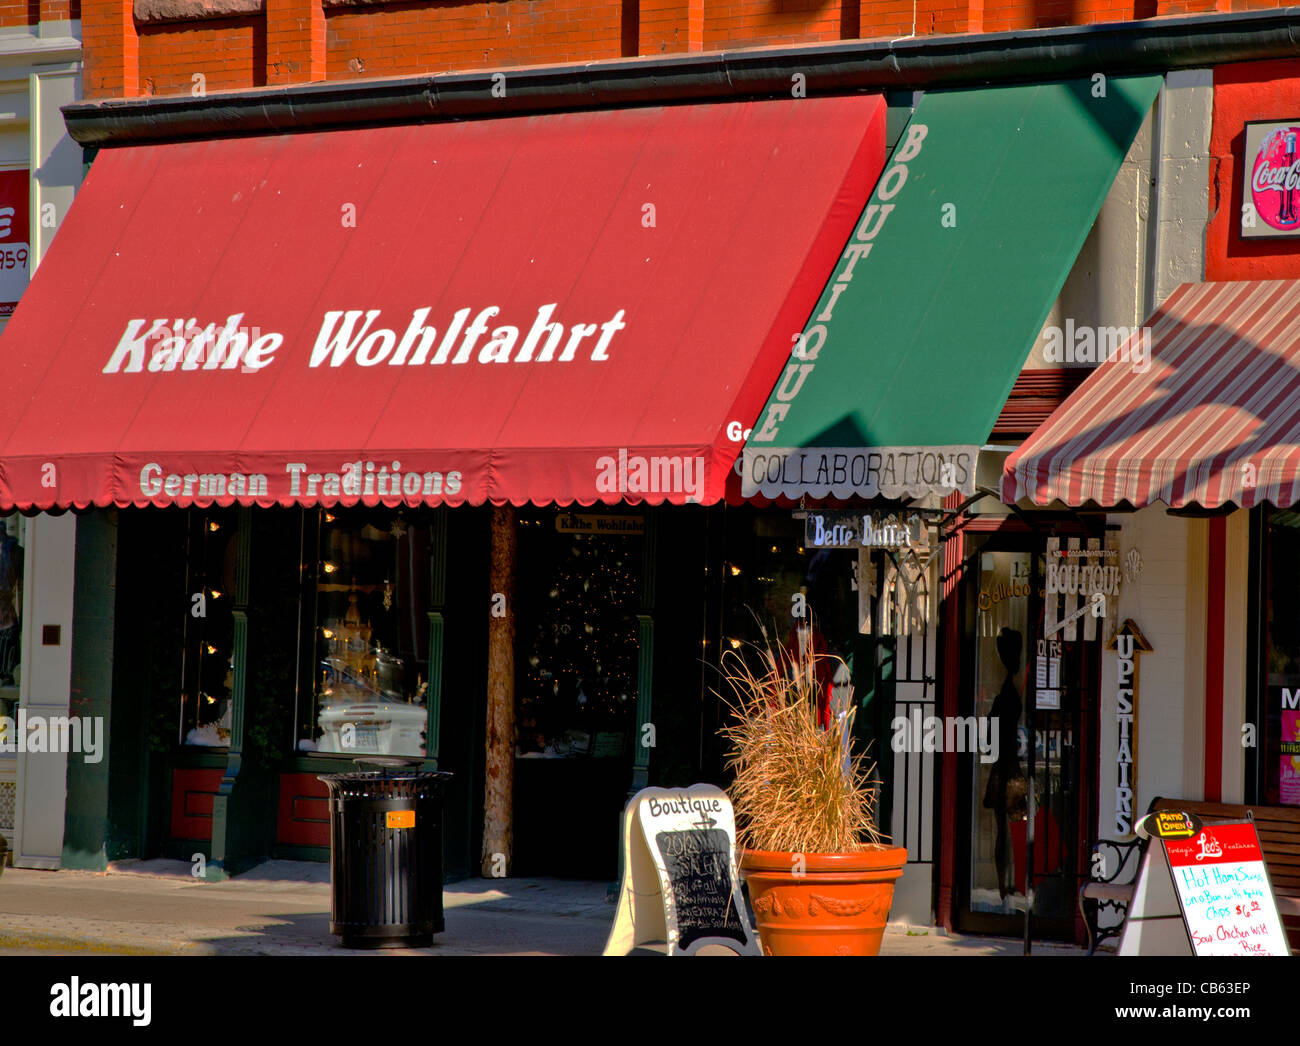 Kathe G. Wohlfart tradizione tedesca shop Stillwater, Minnesota Immagini Stock